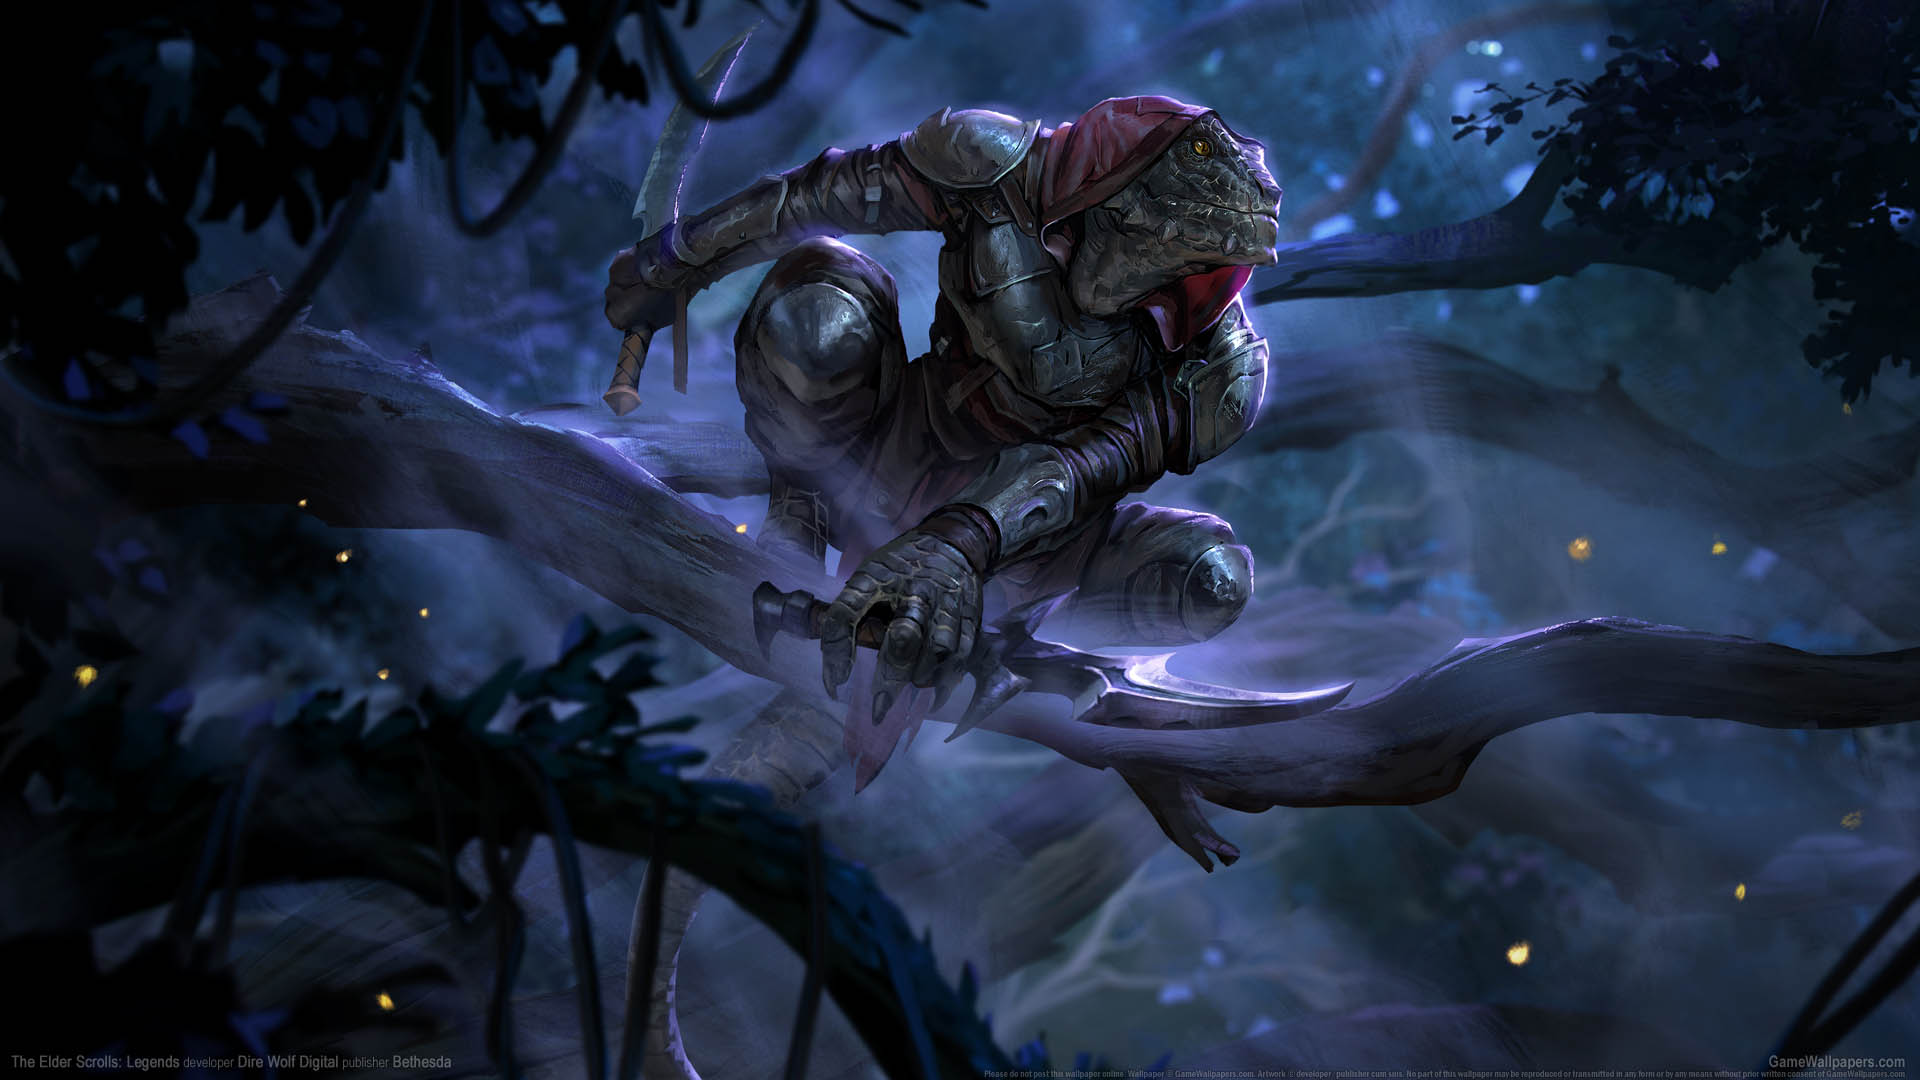 The Elder Scrolls: Legends Hintergrundbild 01 1920x1080